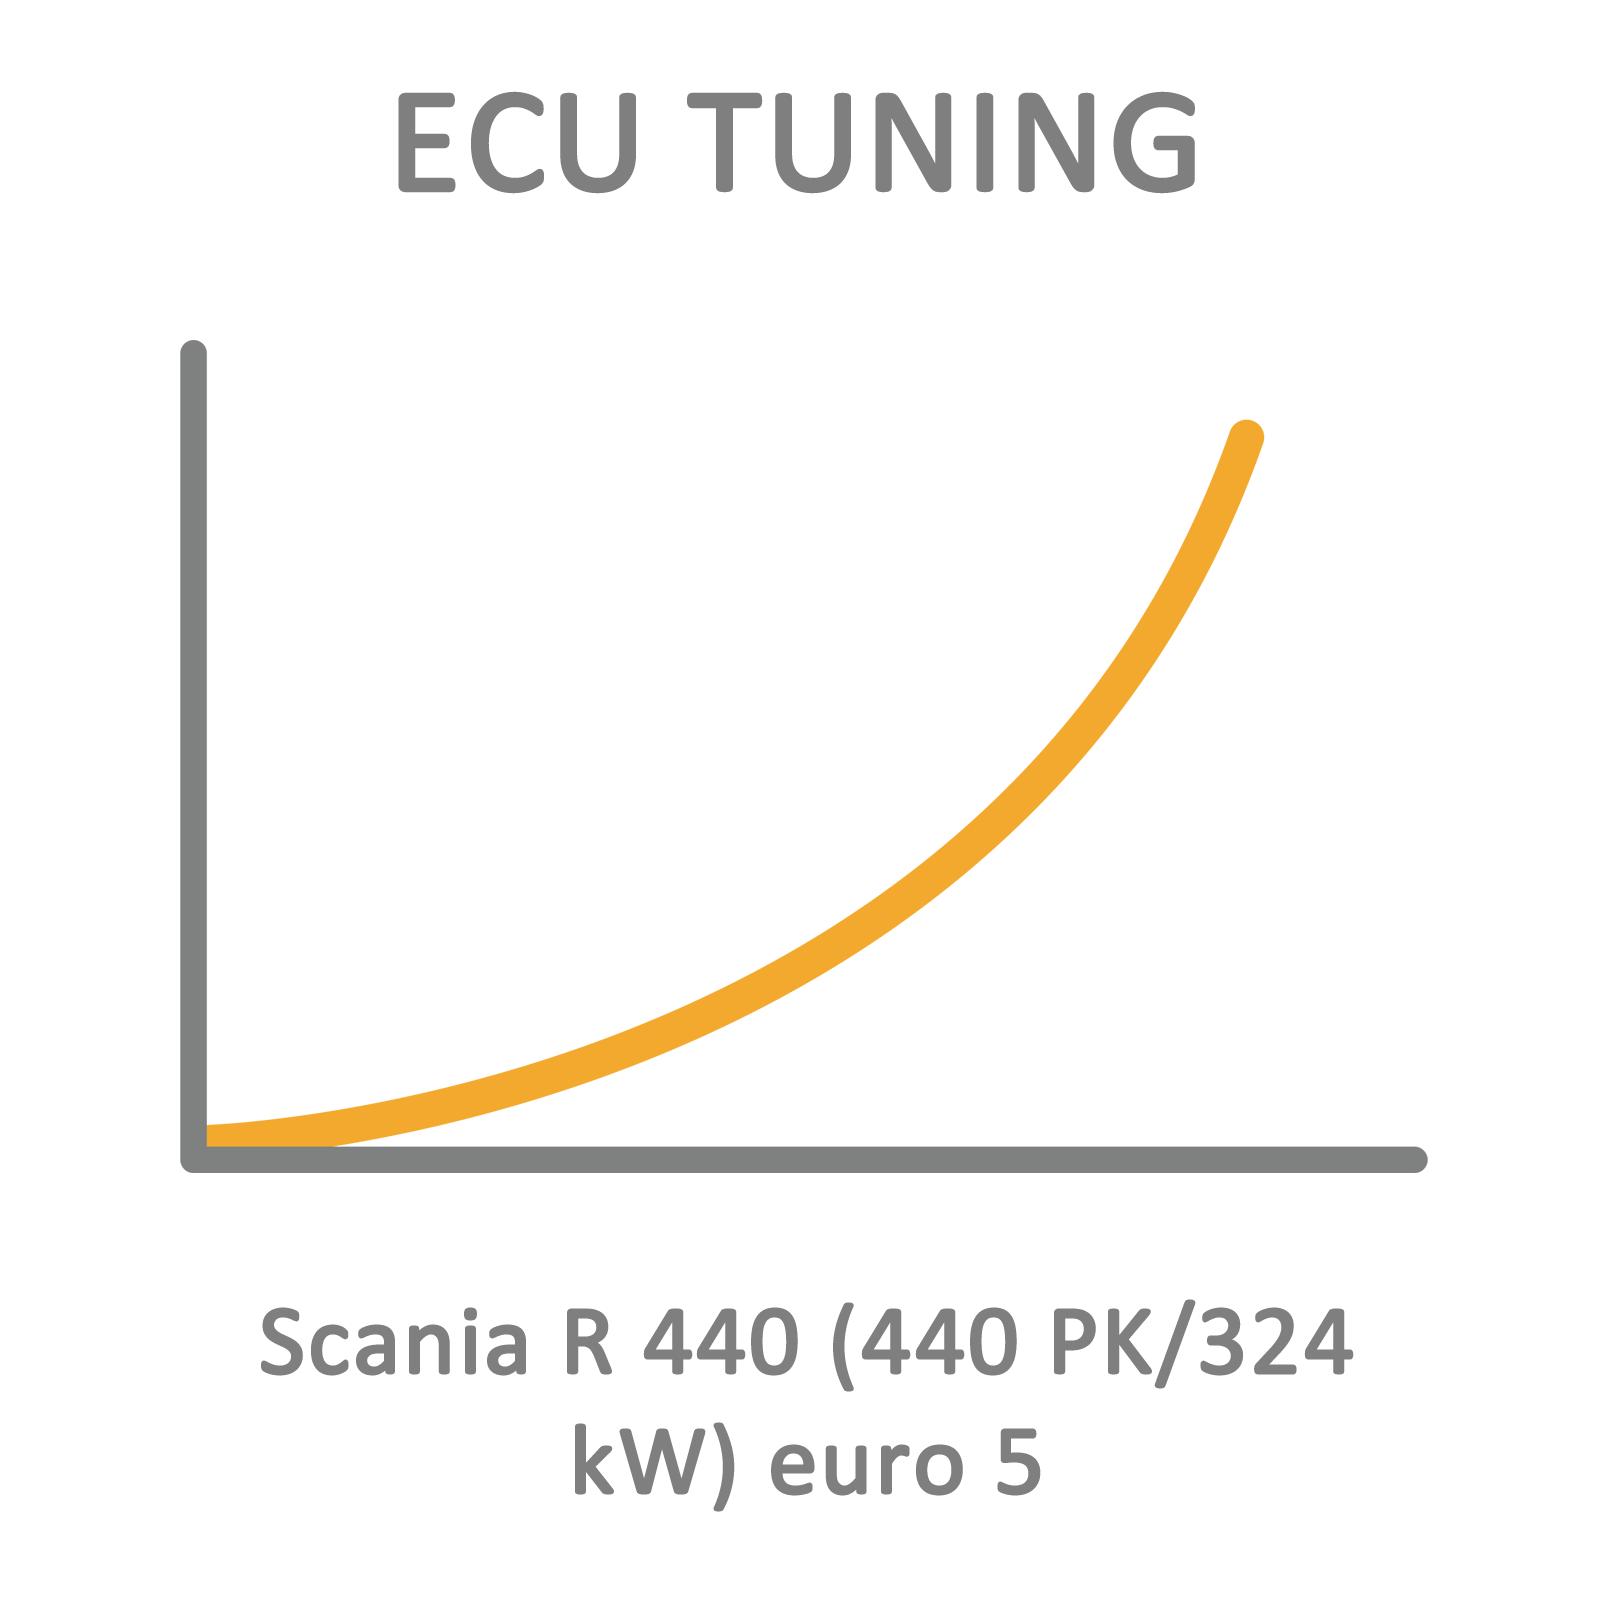 Scania R 440 (440 PK/324 kW) euro 5 ECU Tuning Remapping